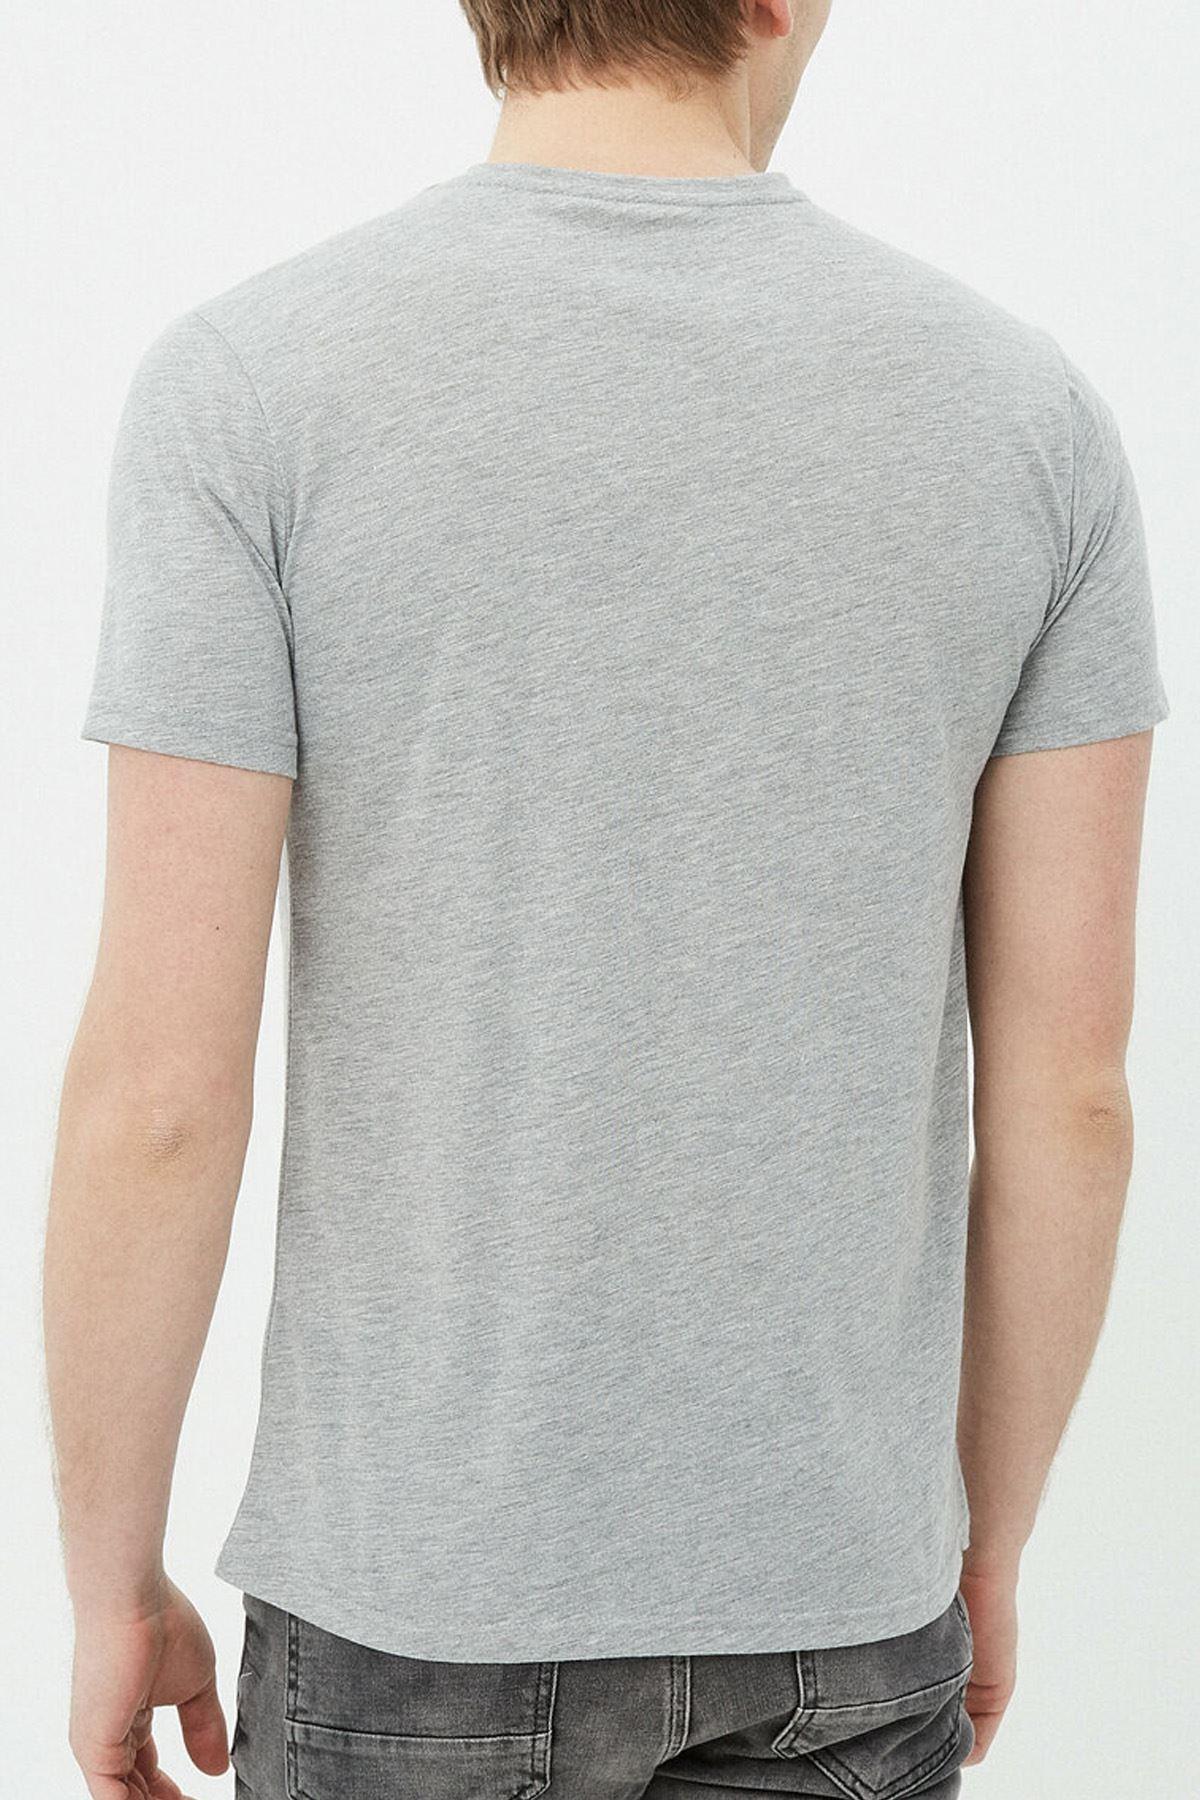 Anime Titan Gri Erkek Tshirt - Tişört